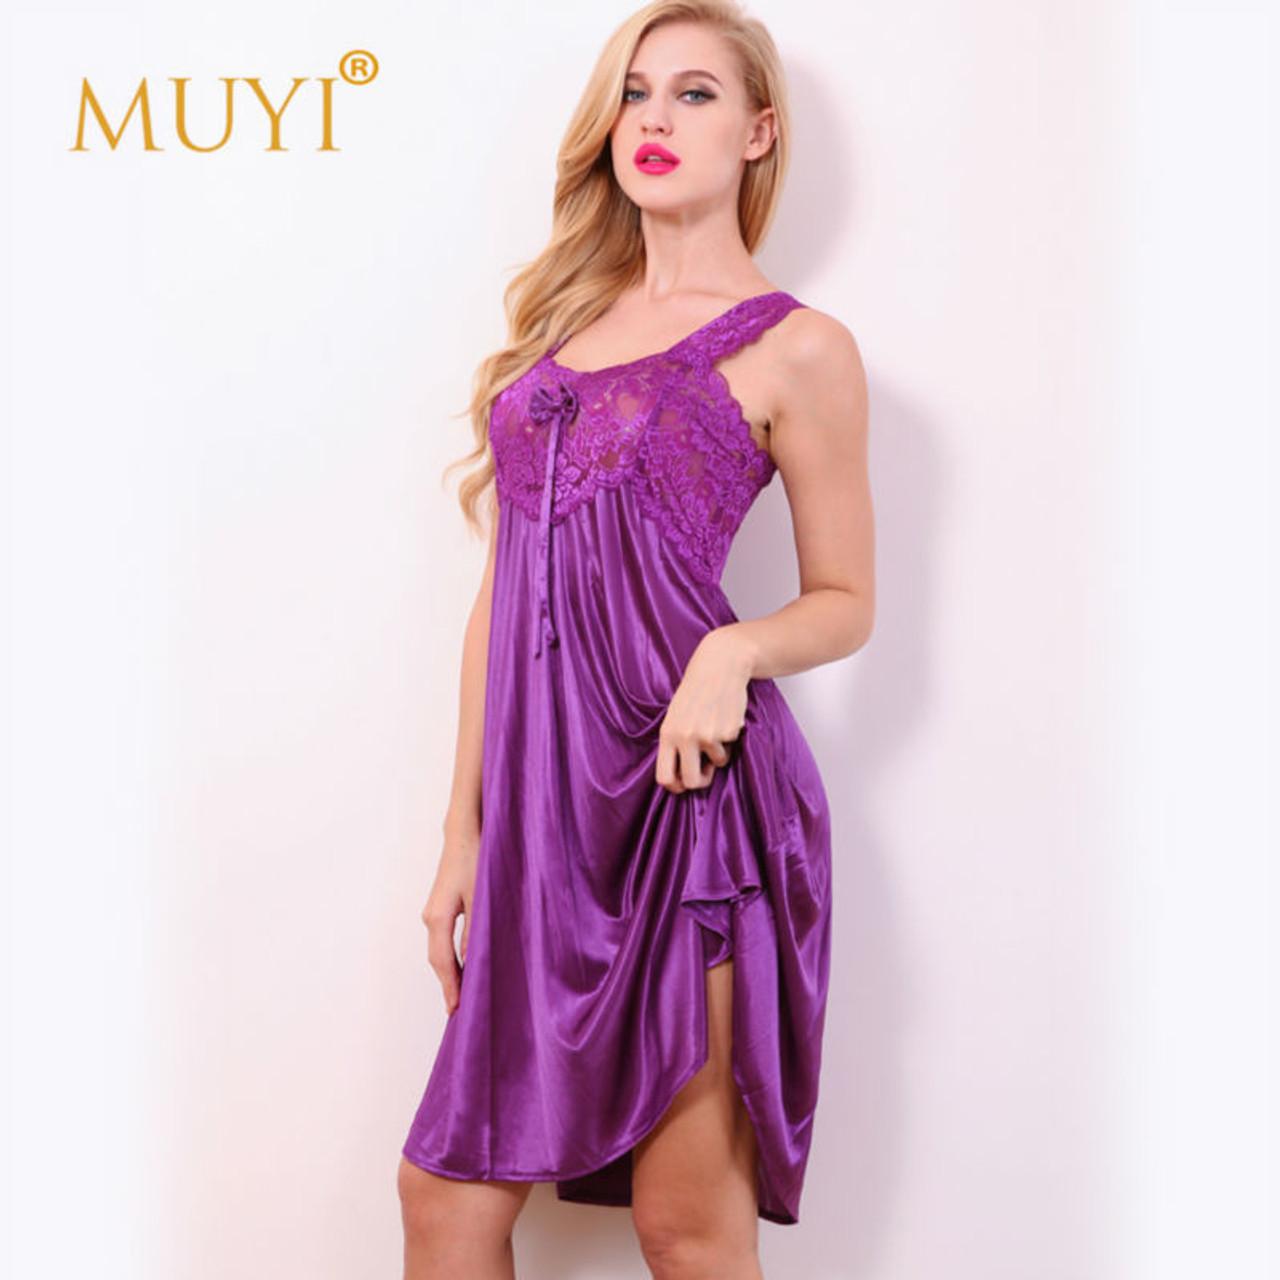 db142652ba ... Nightgowns Sexy Sleepwear Women Nightwear Sexy Night Dresses Lace  Babydoll Dress Sleep Lounge Plus Size Nightgown ...